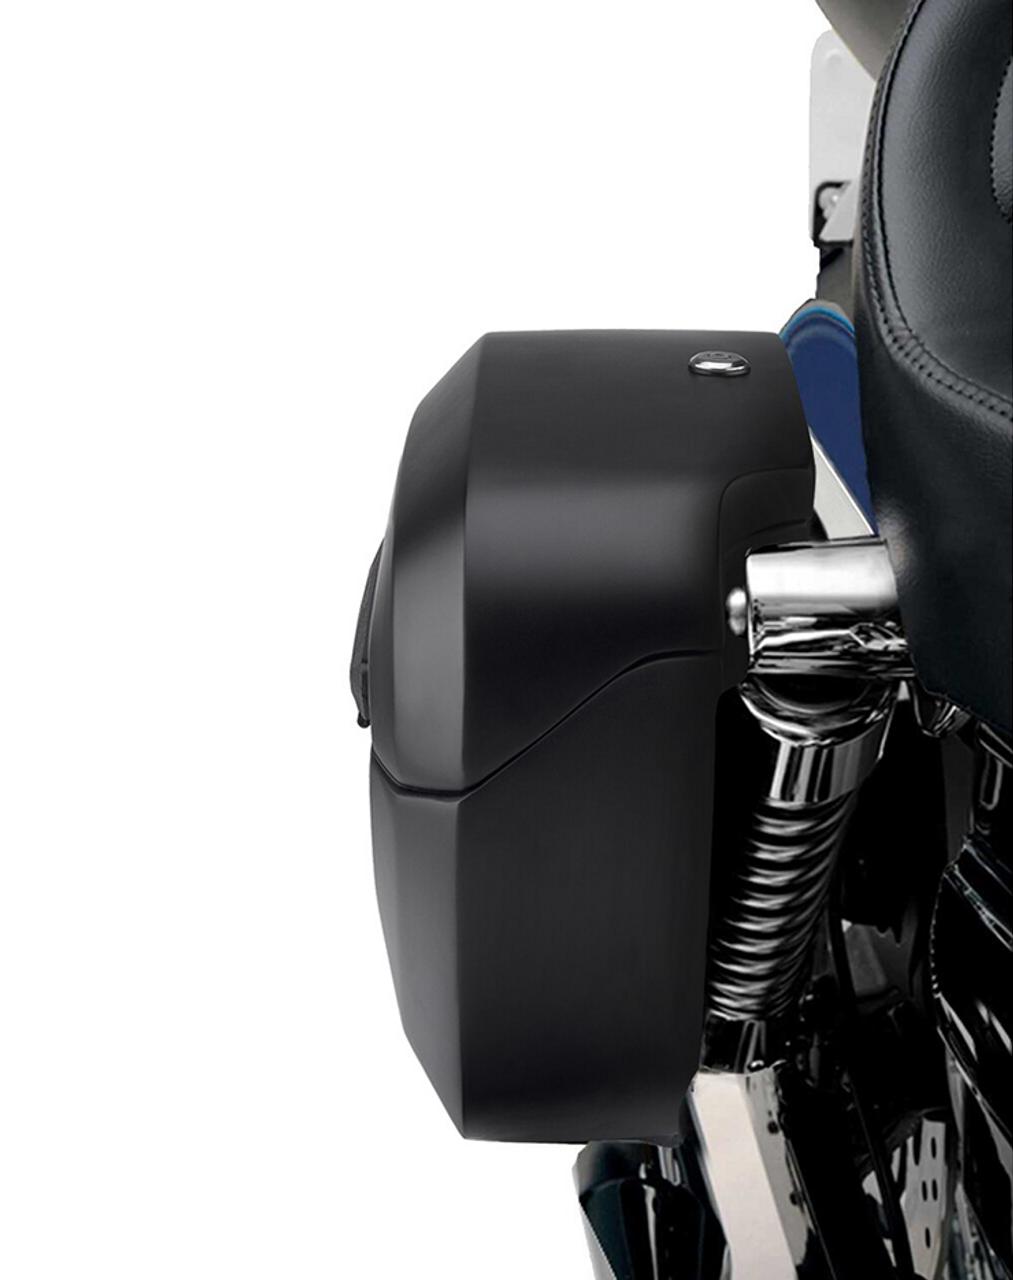 Viking Lamellar Shock Cutout Large Matte Motorcycle Hard Saddlebags For Honda VTX 1800 S Shock Cutout View